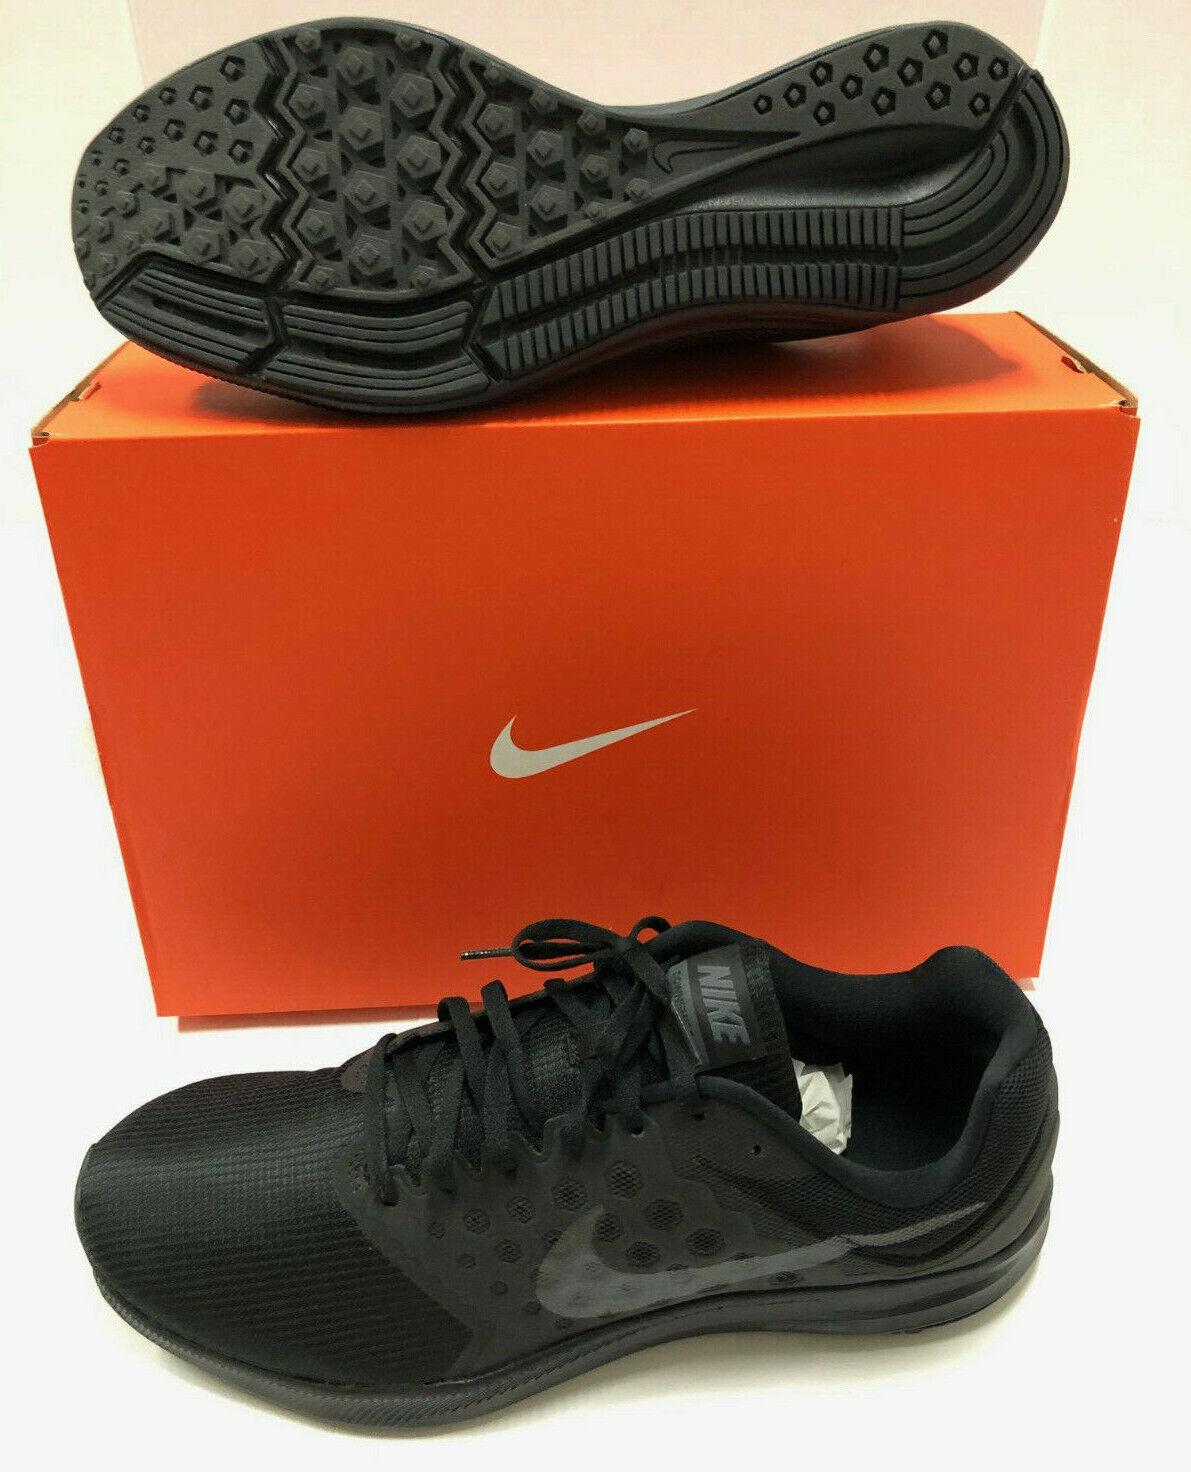 Nib Mens Nike Downshifter 7 Black Silver Mesh Running shoes 13